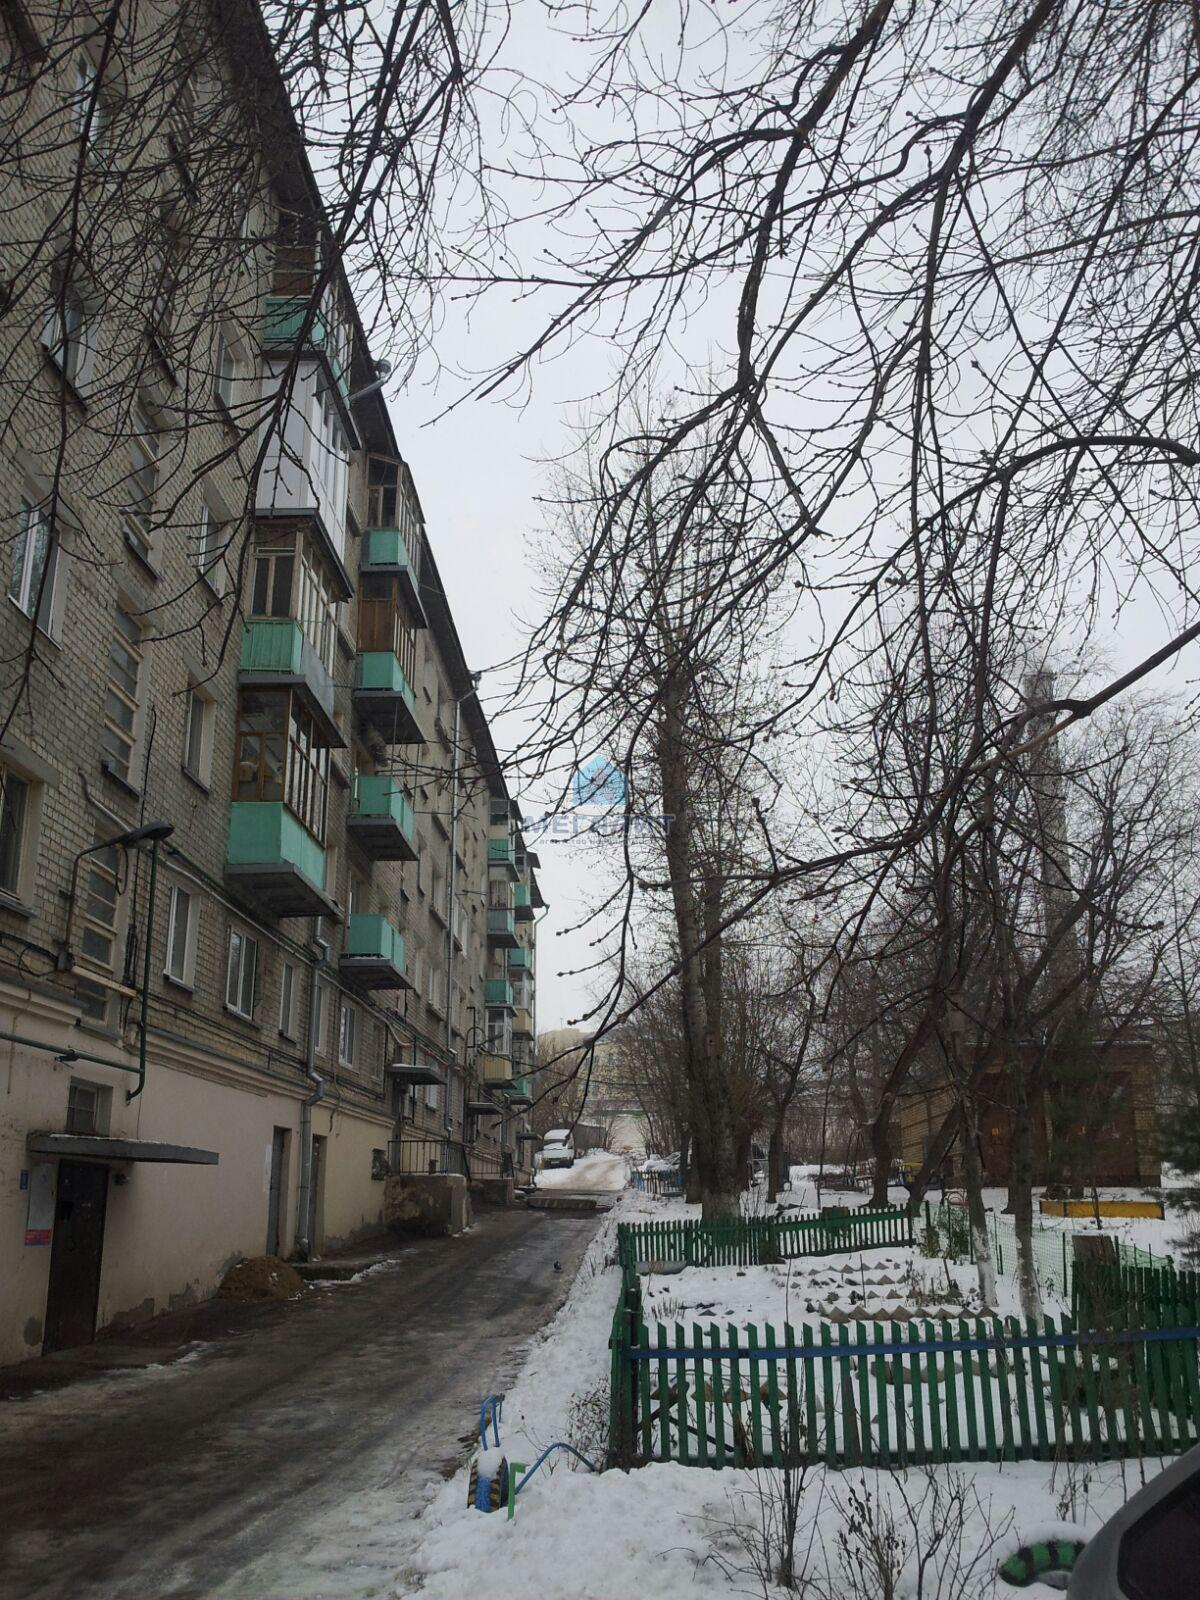 Аренда 2-к квартиры Краснооктябрьская 17, 45.0 м² (миниатюра №10)